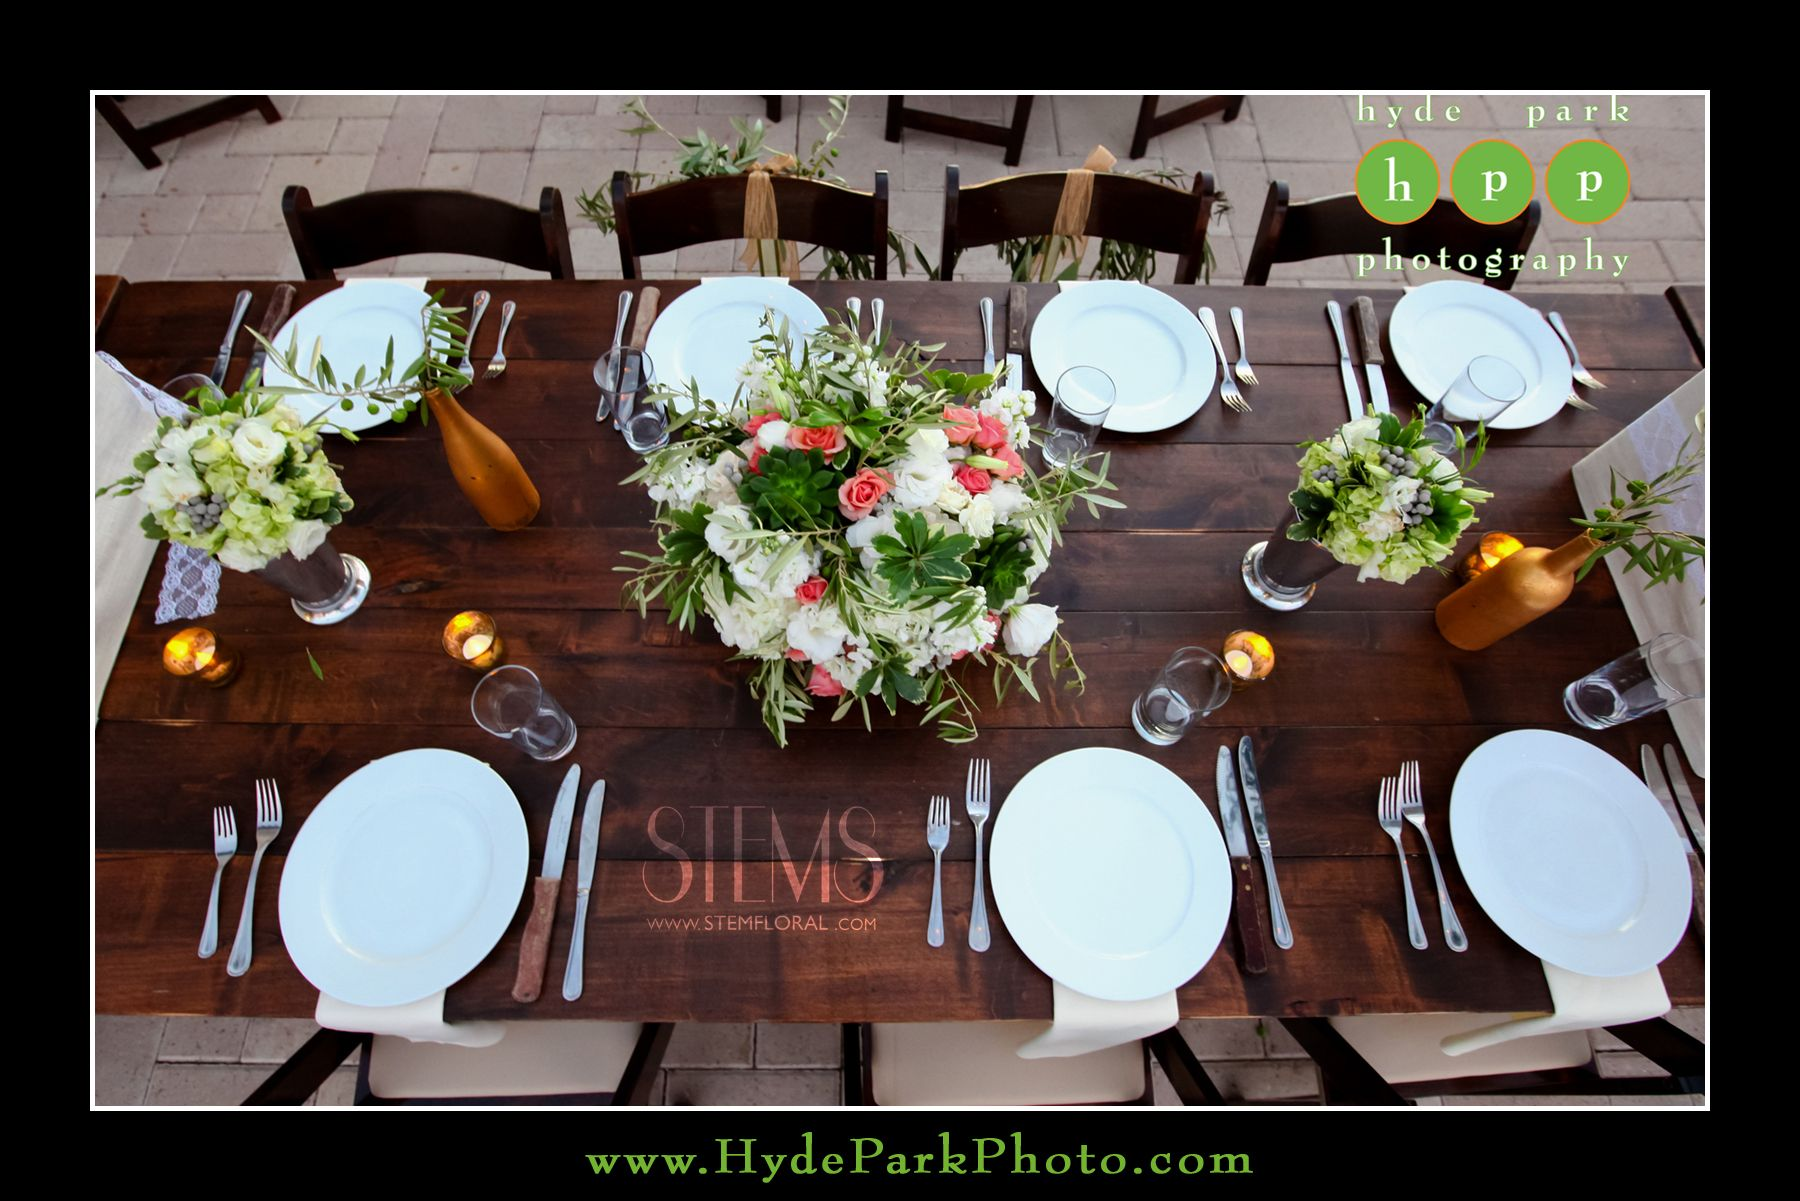 Vineyards at Chappel Lodge Weddings  #stemsfloraldesign #stemsproductions   www.stemfloral.com  I  www.stemproduction.com  I  http://hydeparkphoto.com  I  http://www.livbydesignevents.com  I  http://www.chappellodge.com